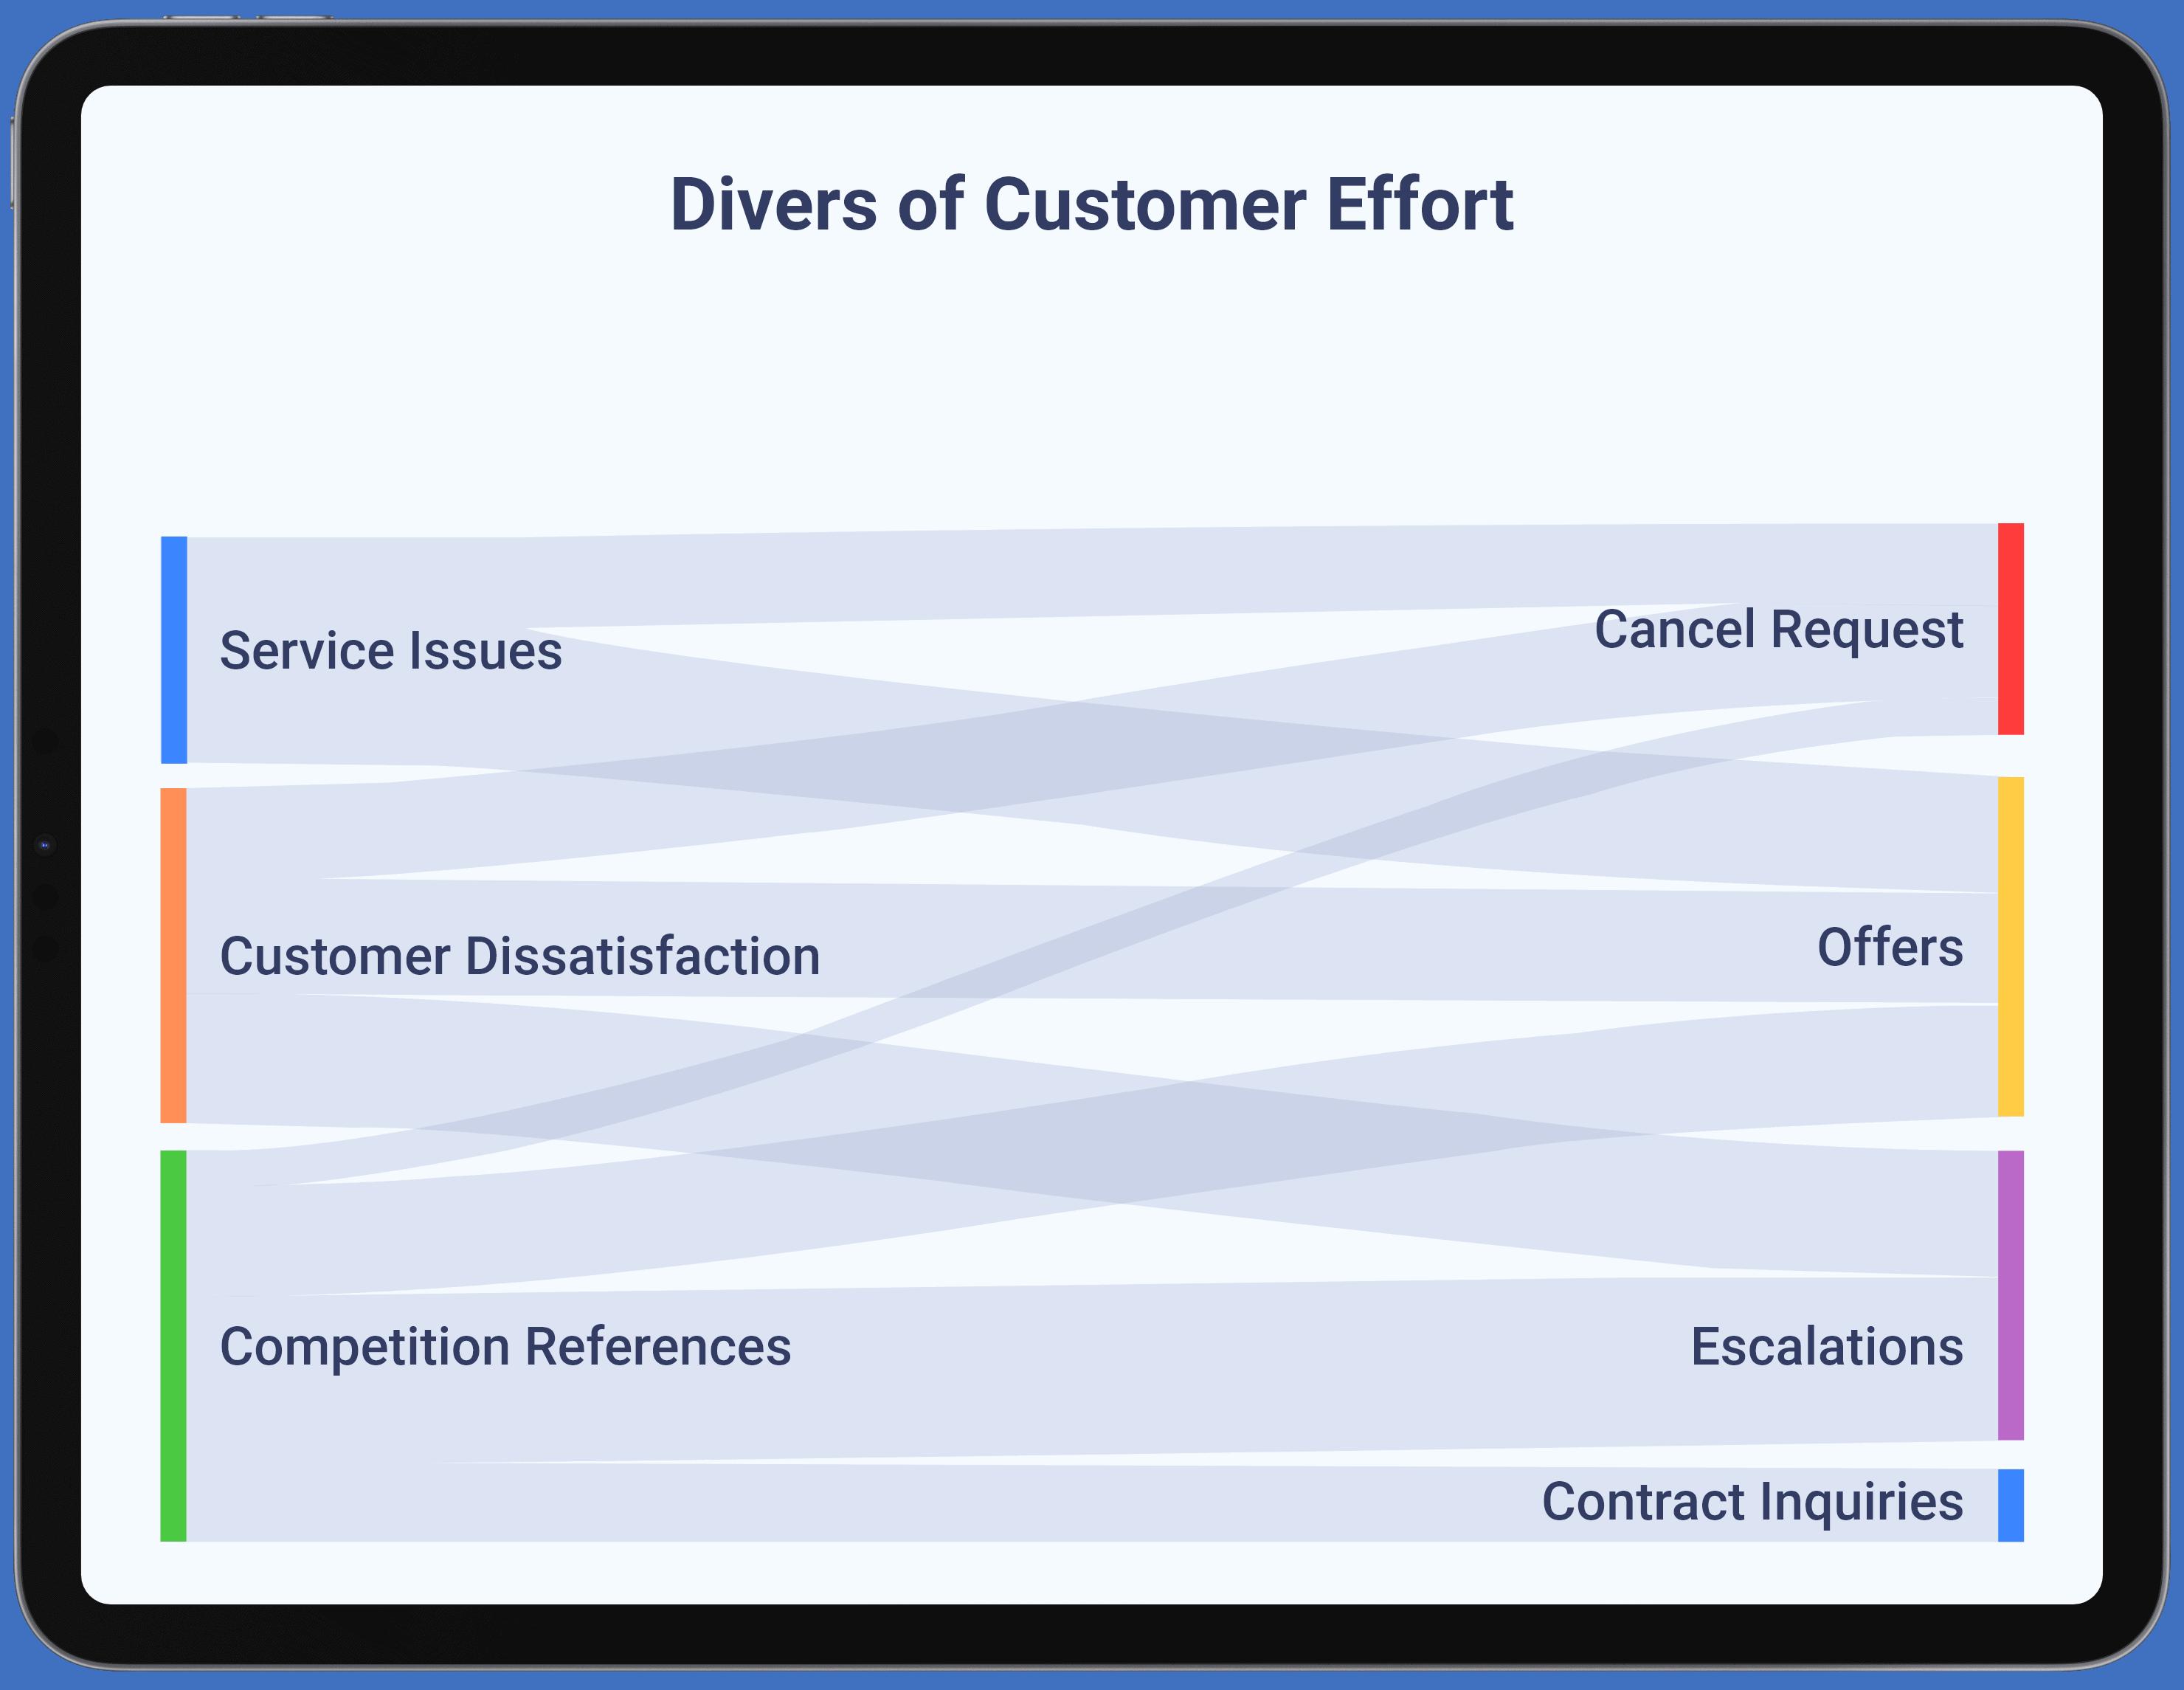 Telecommunications - Reduce Customer Effort